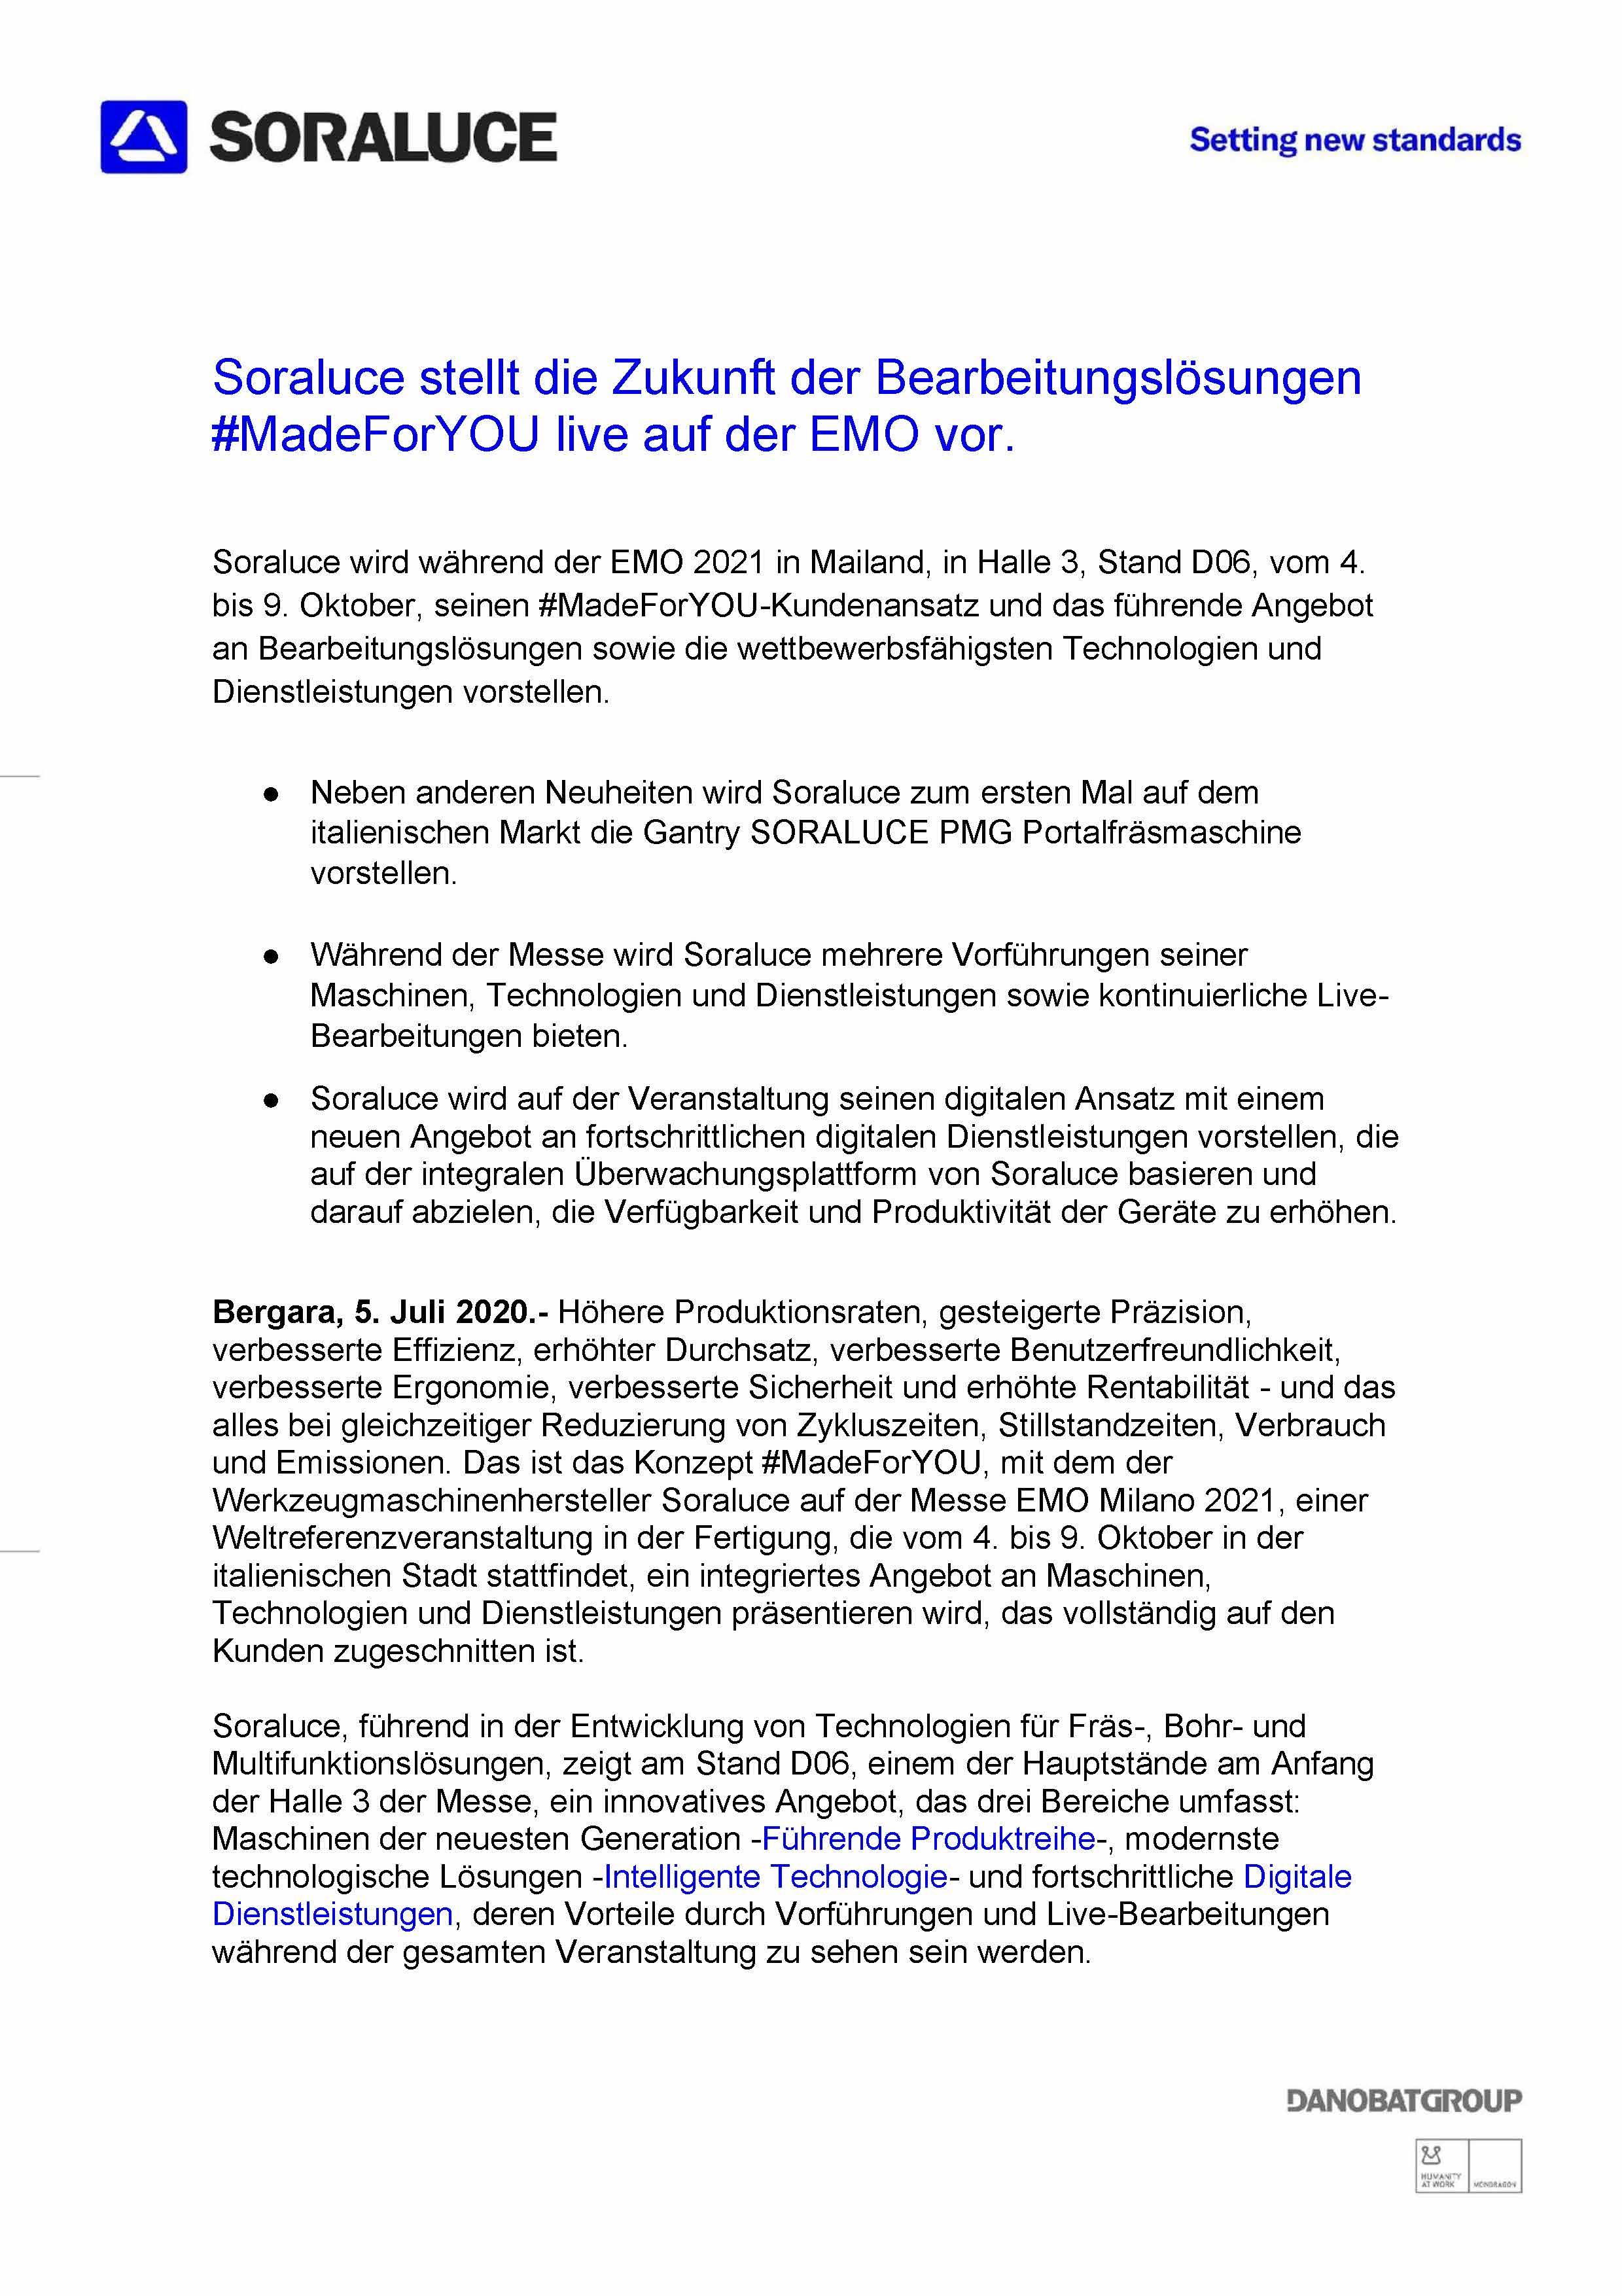 Comunicato stampa (tedesco)